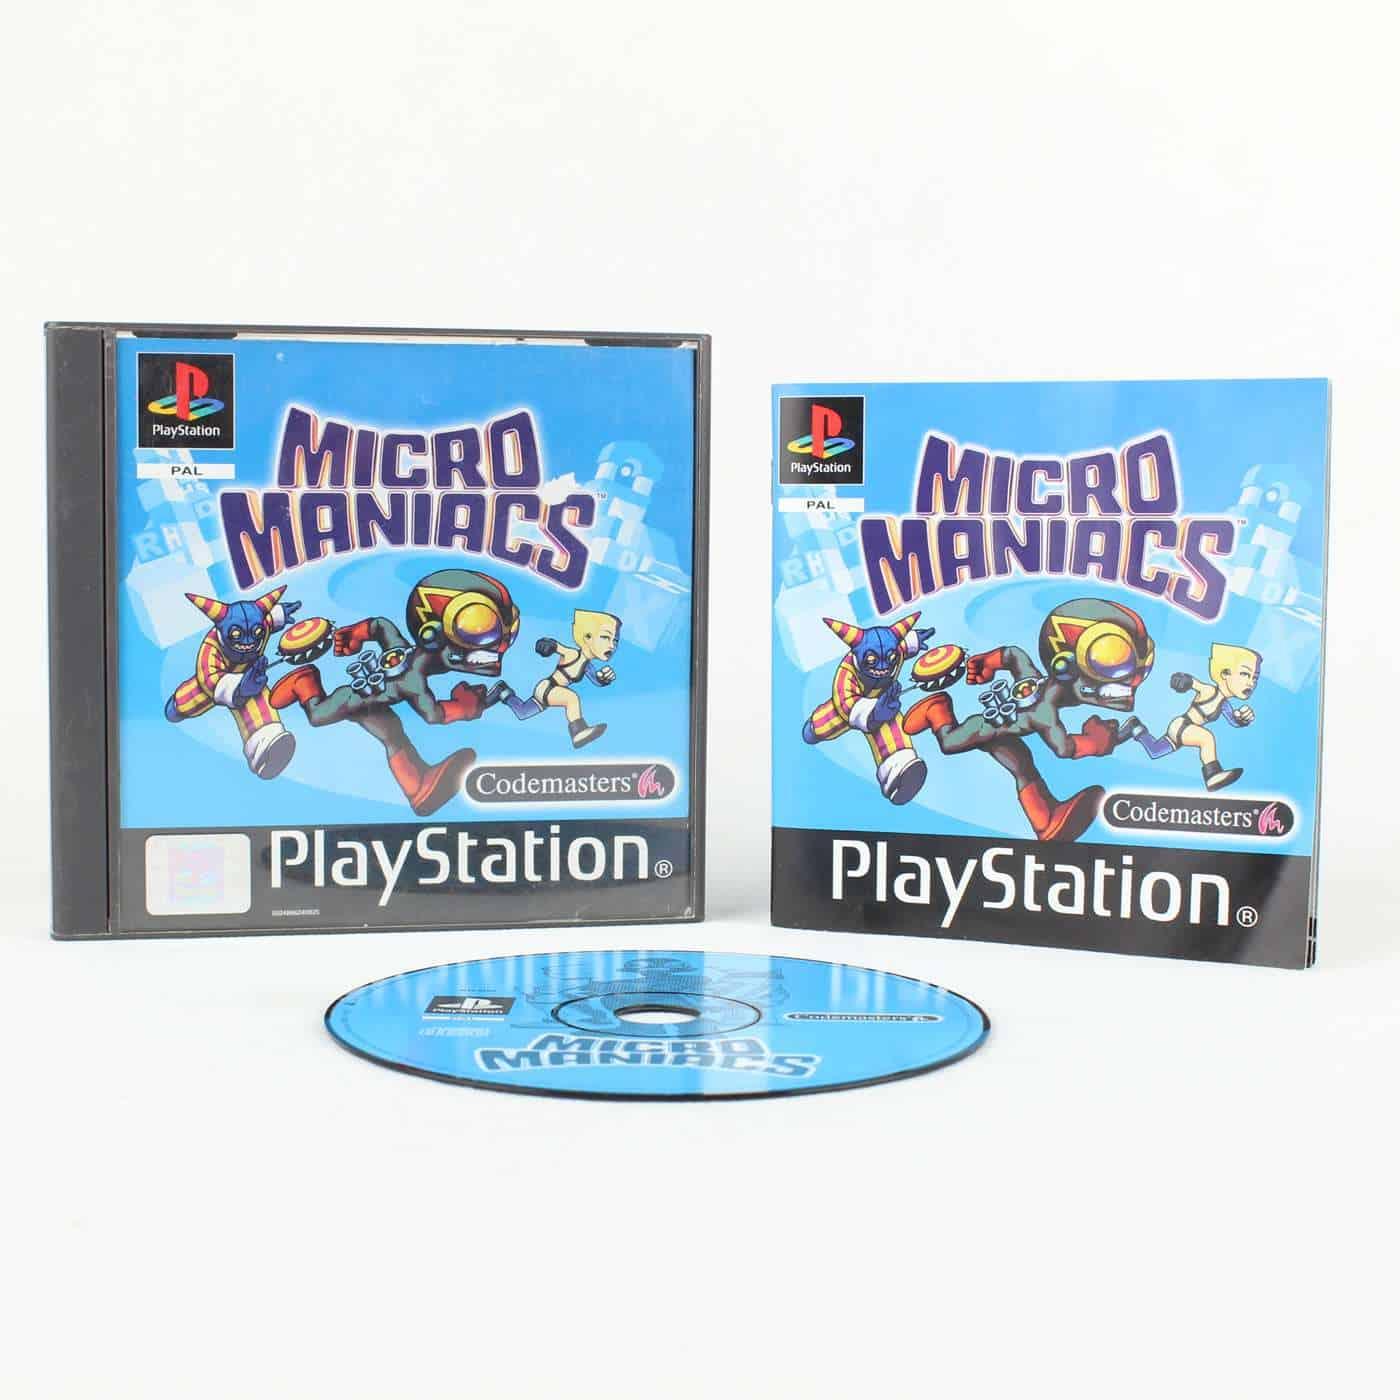 Micro Maniacs (Playstation 1)